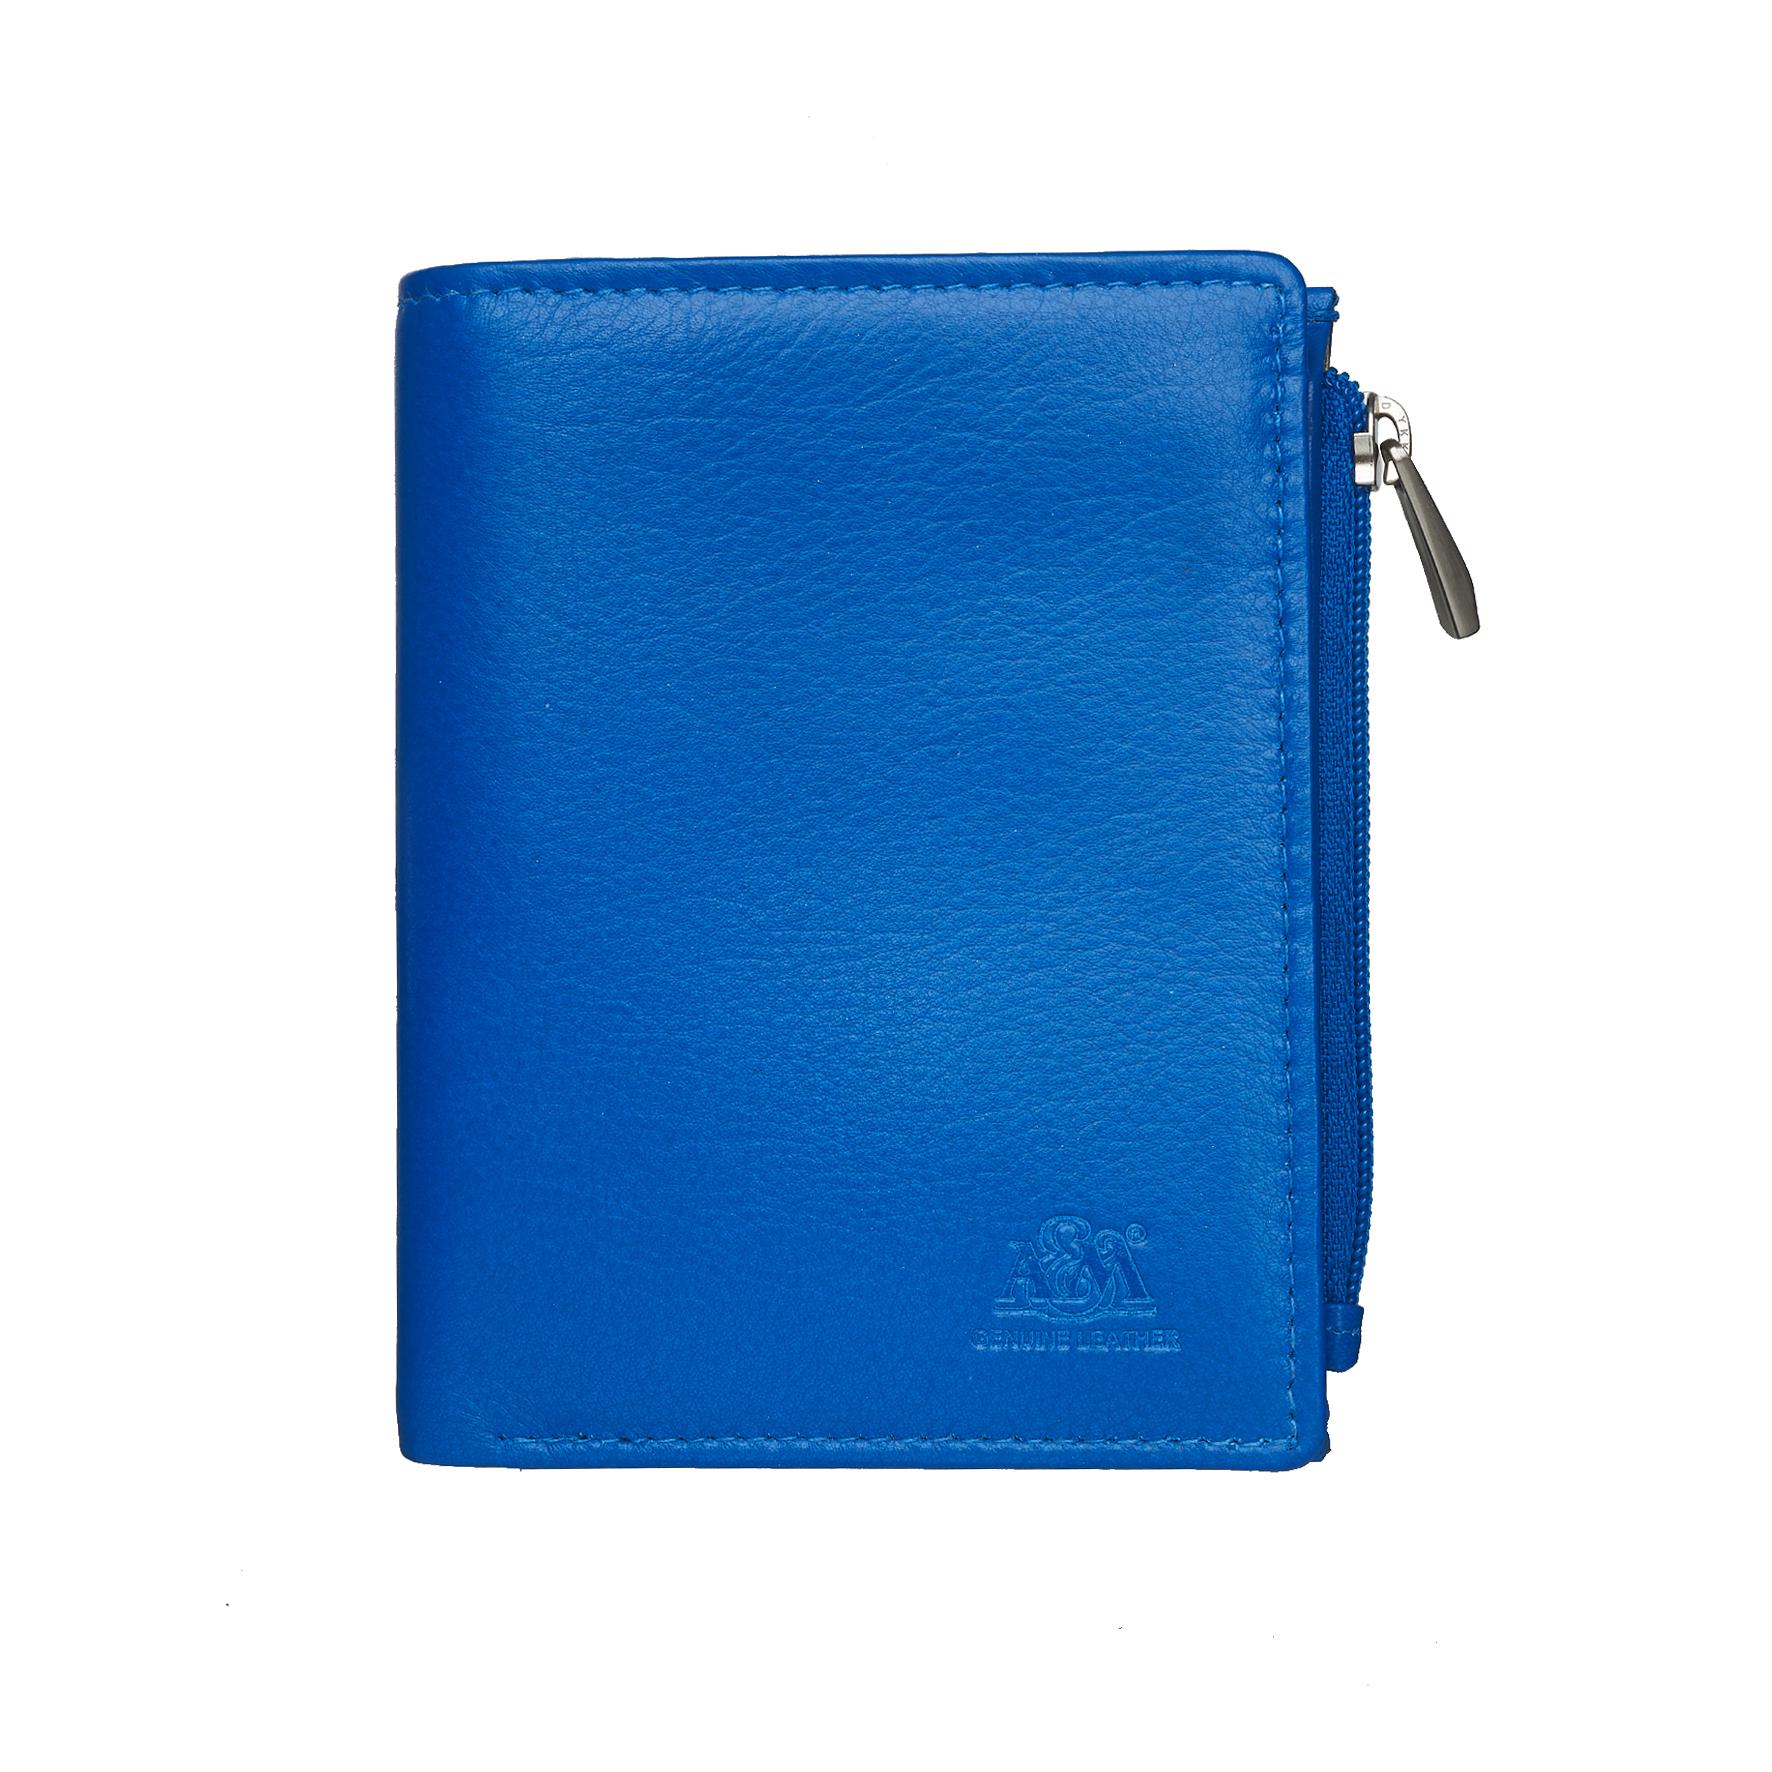 Портмоне A&M женское, 2655N.Blue, синий, синий gangxun синий m